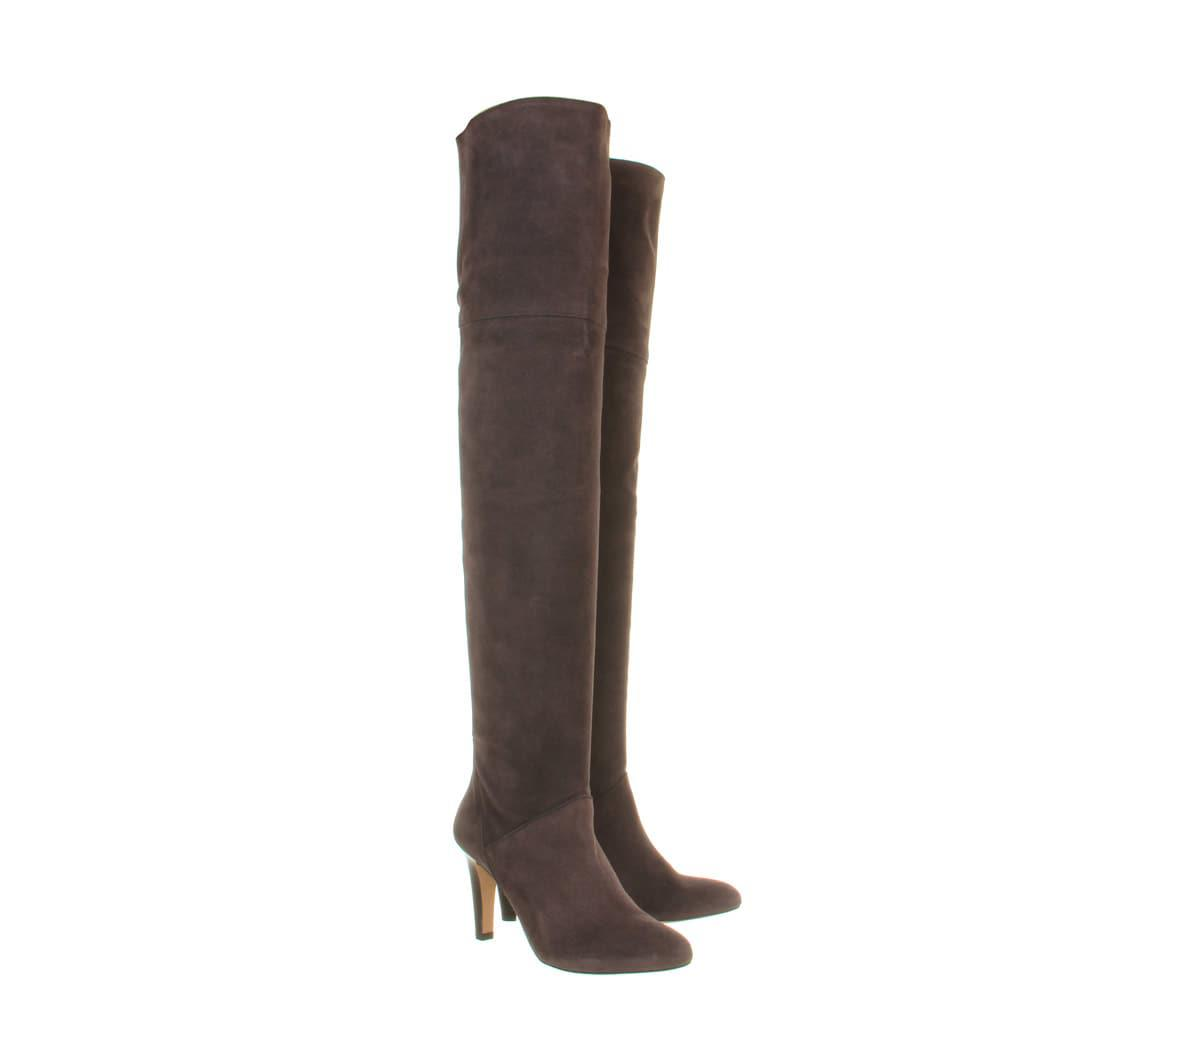 Gallery Women S Thigh High Boots